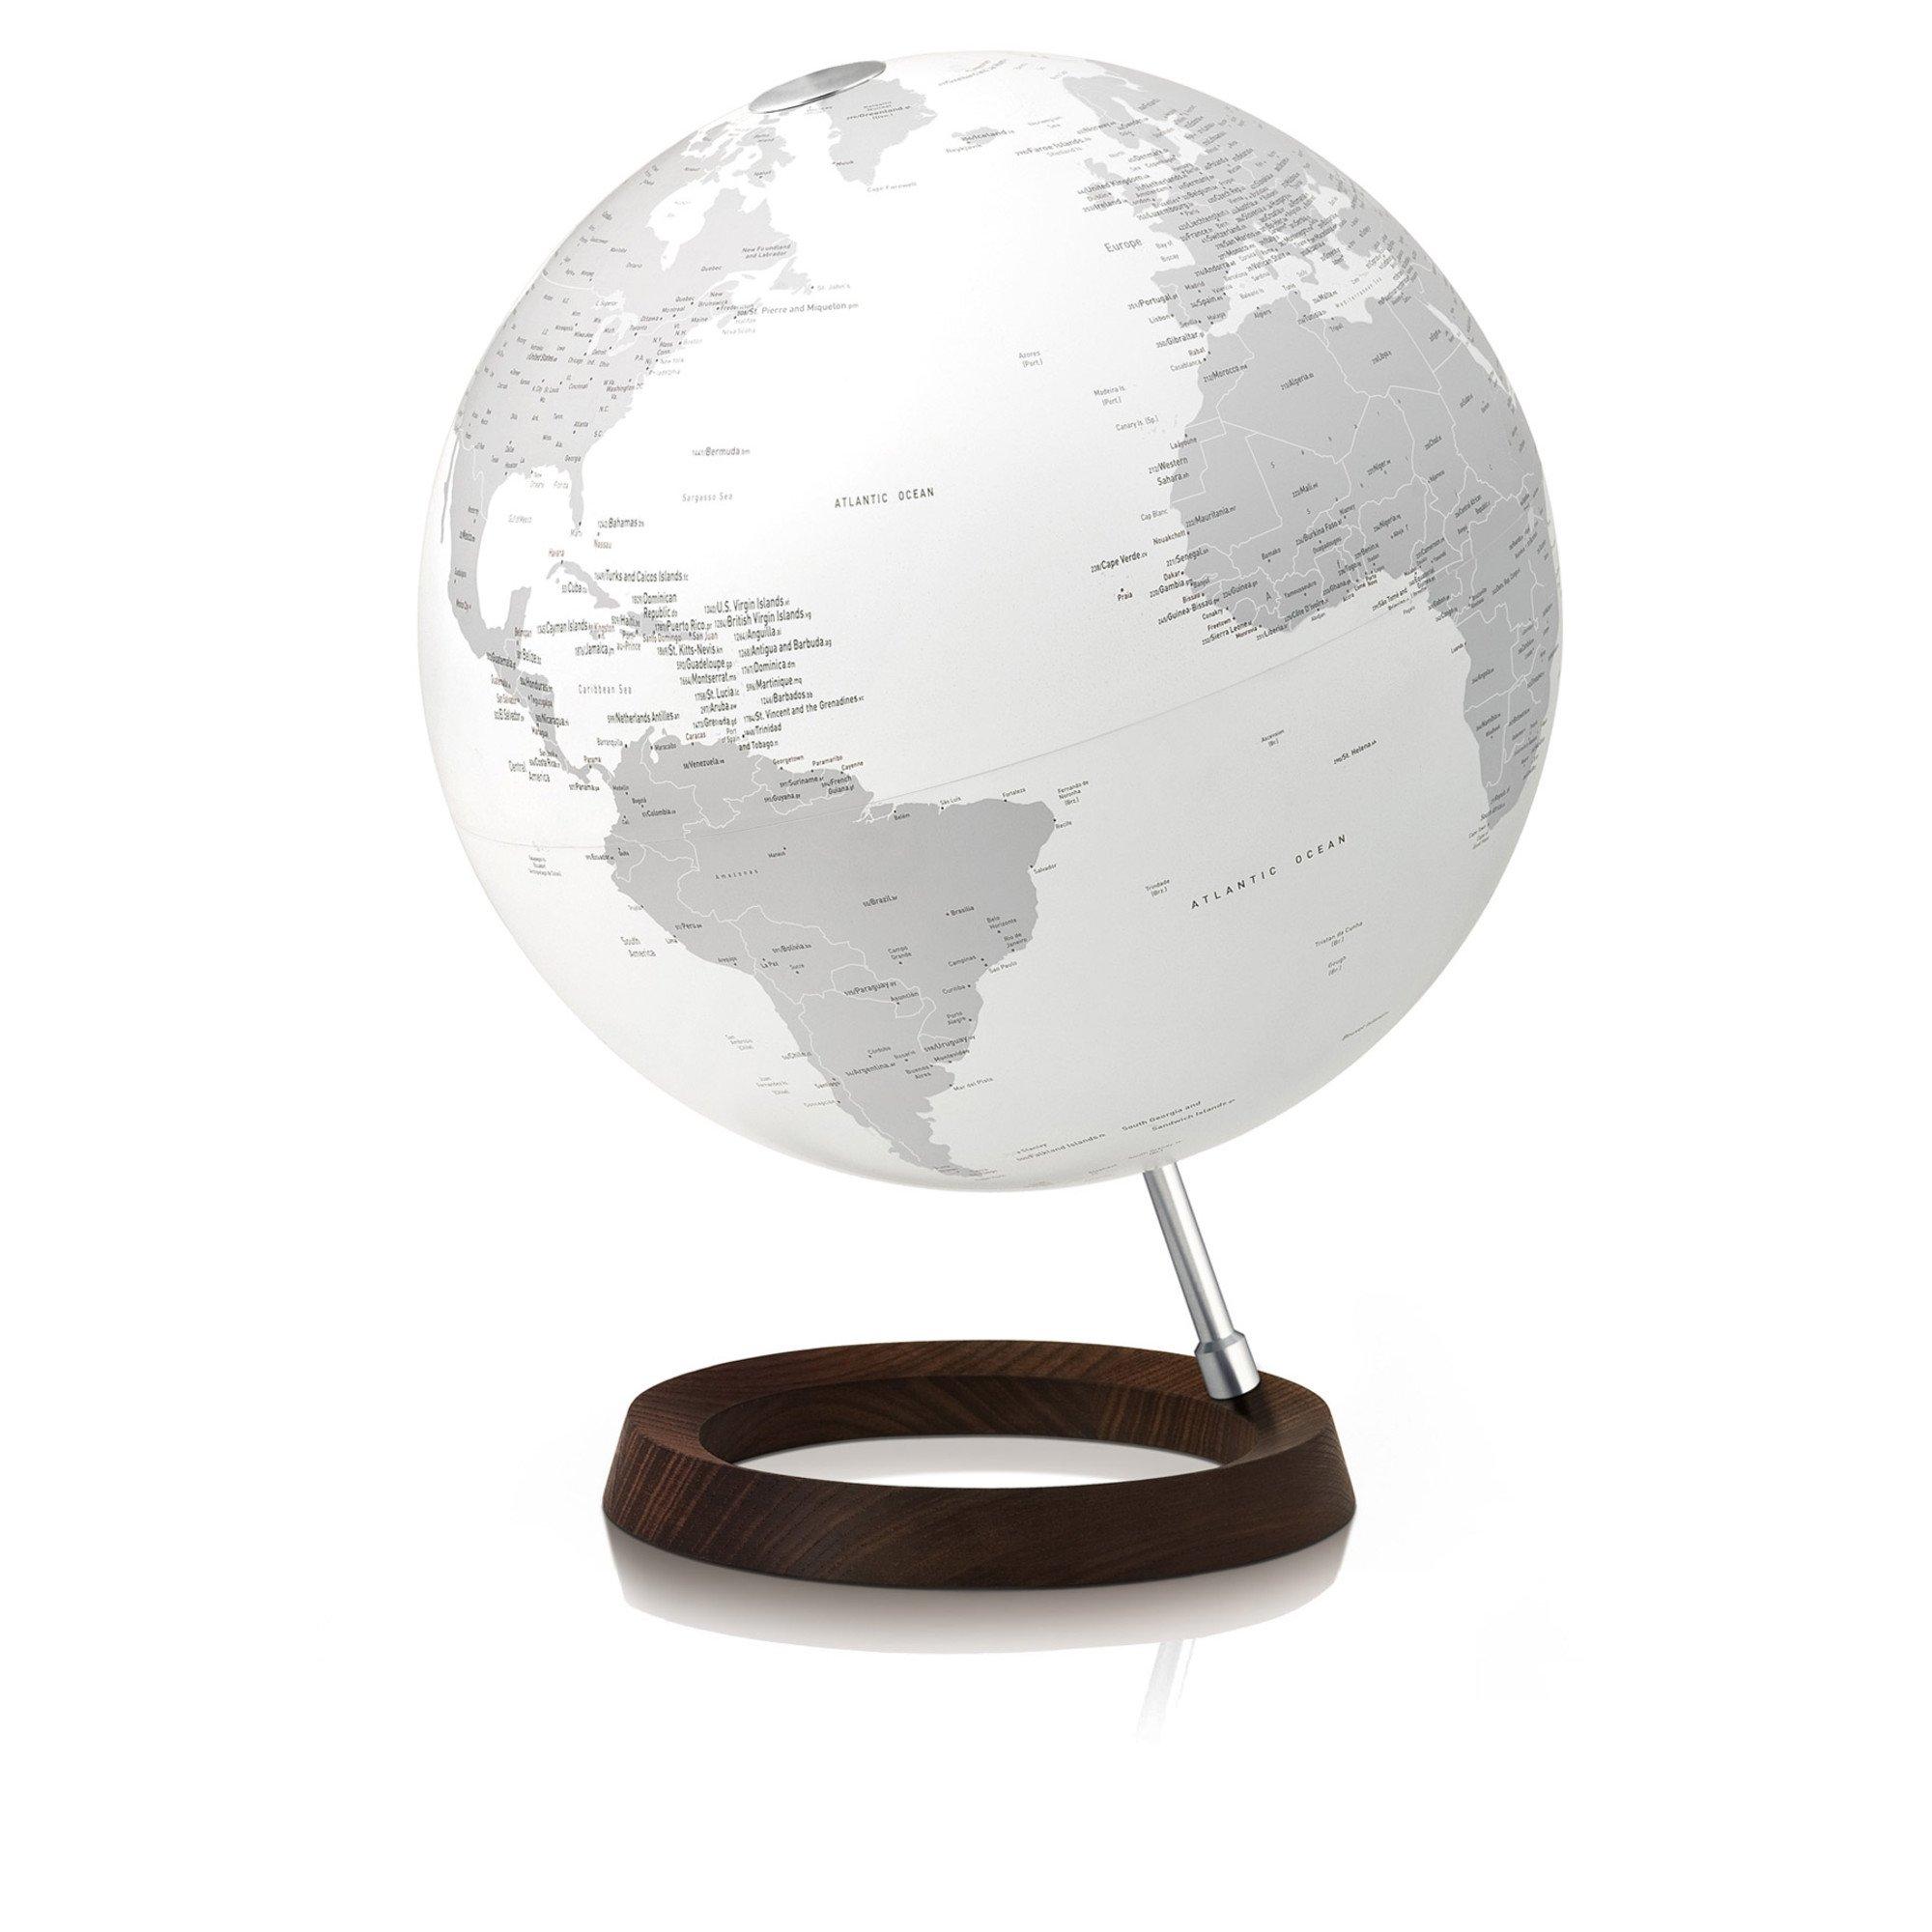 Räthgloben 1917 Full Circle Reflection globe